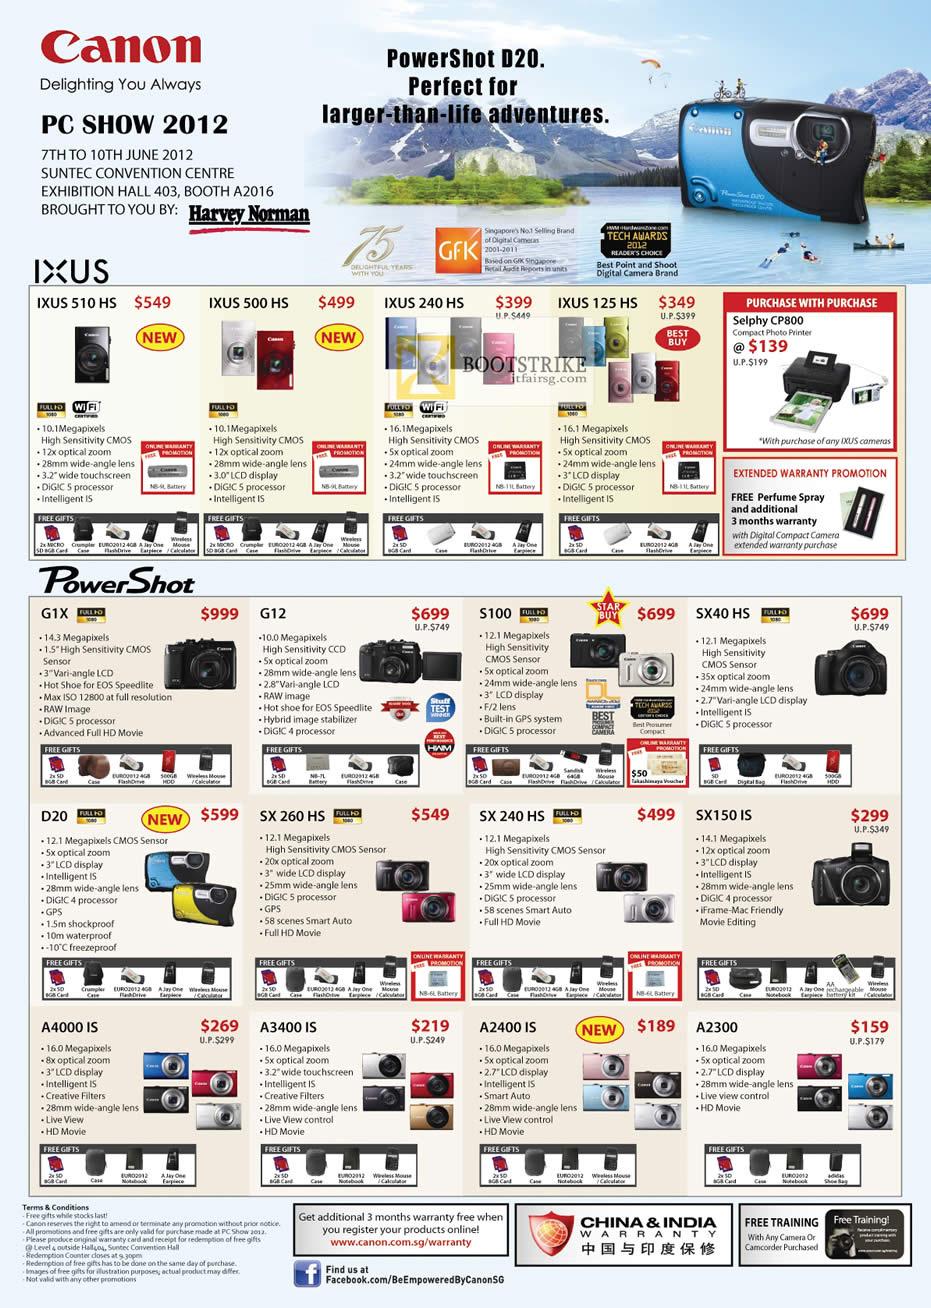 Camera Canon Camera Comparison Dslr dslr canon camera pic best digital slr reviews price cameras eos 7d